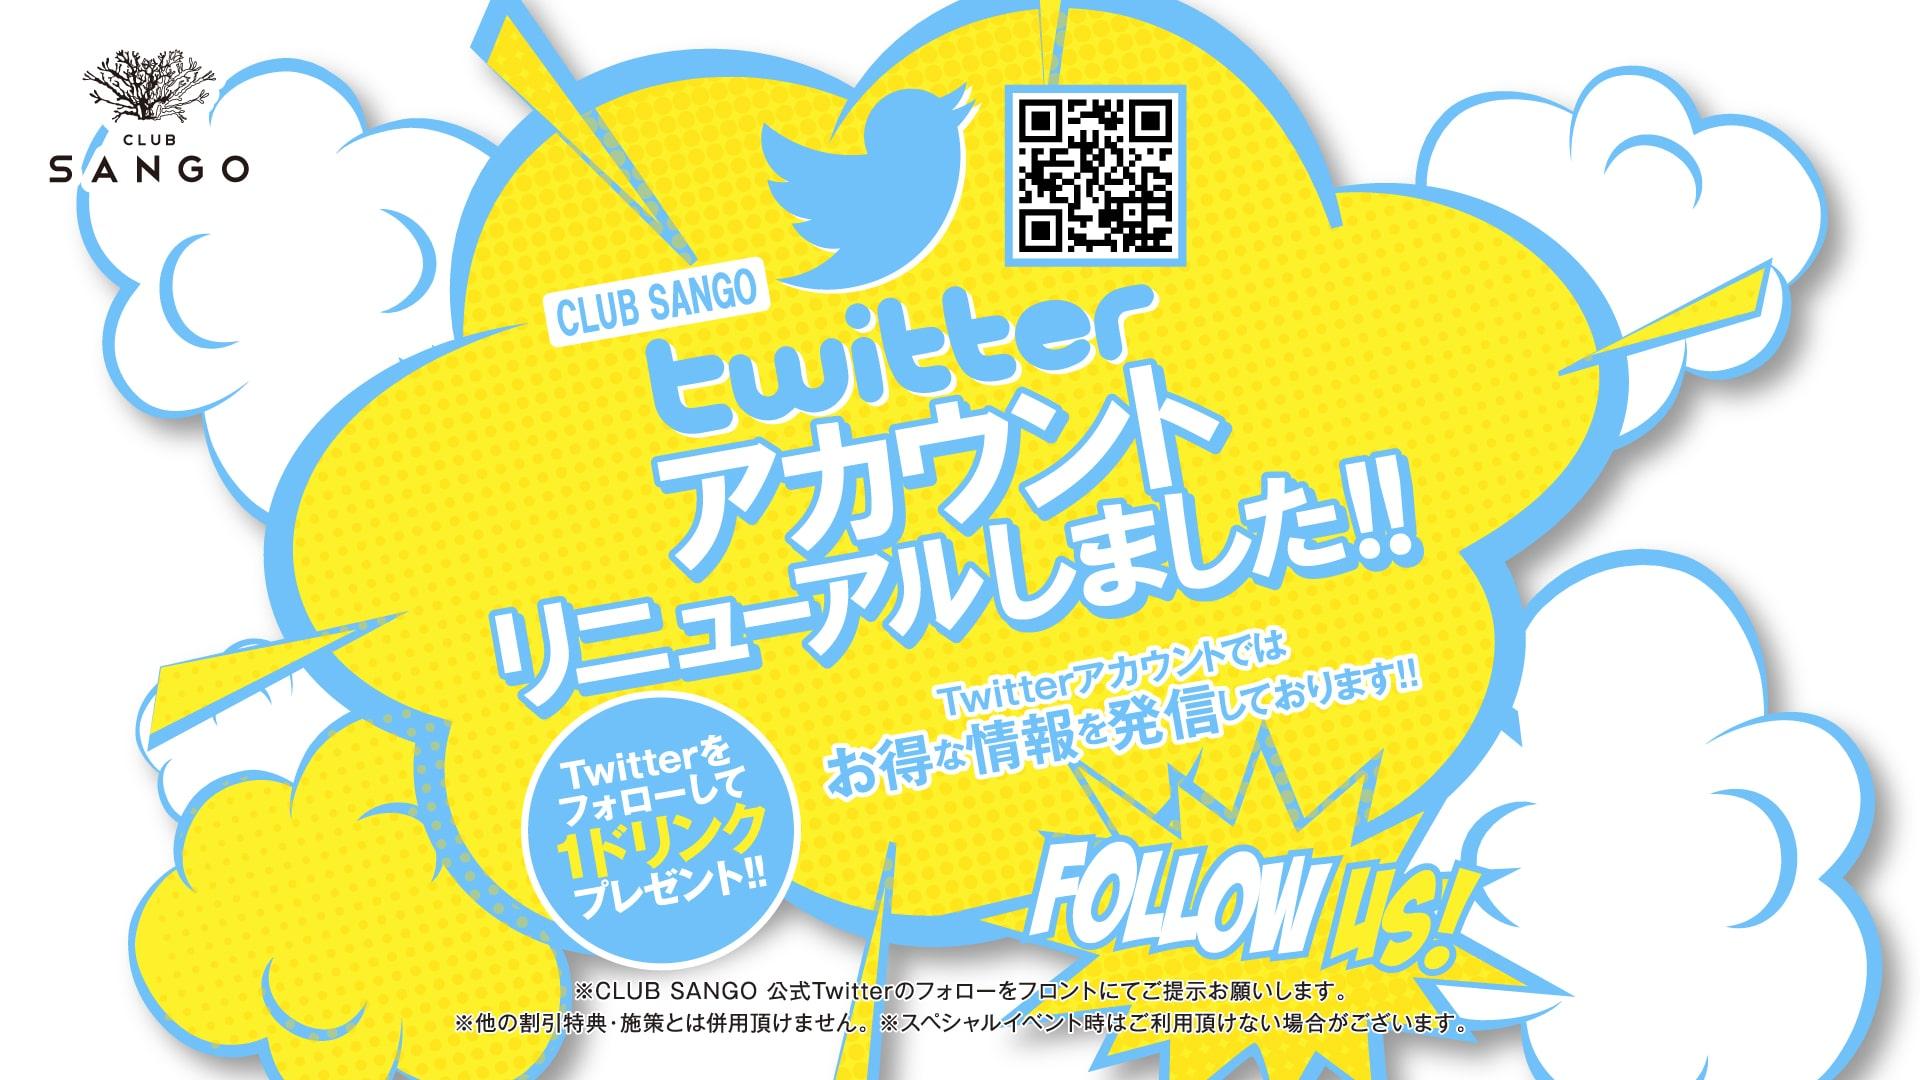 SANGO Twitter 新アカウントが始動!